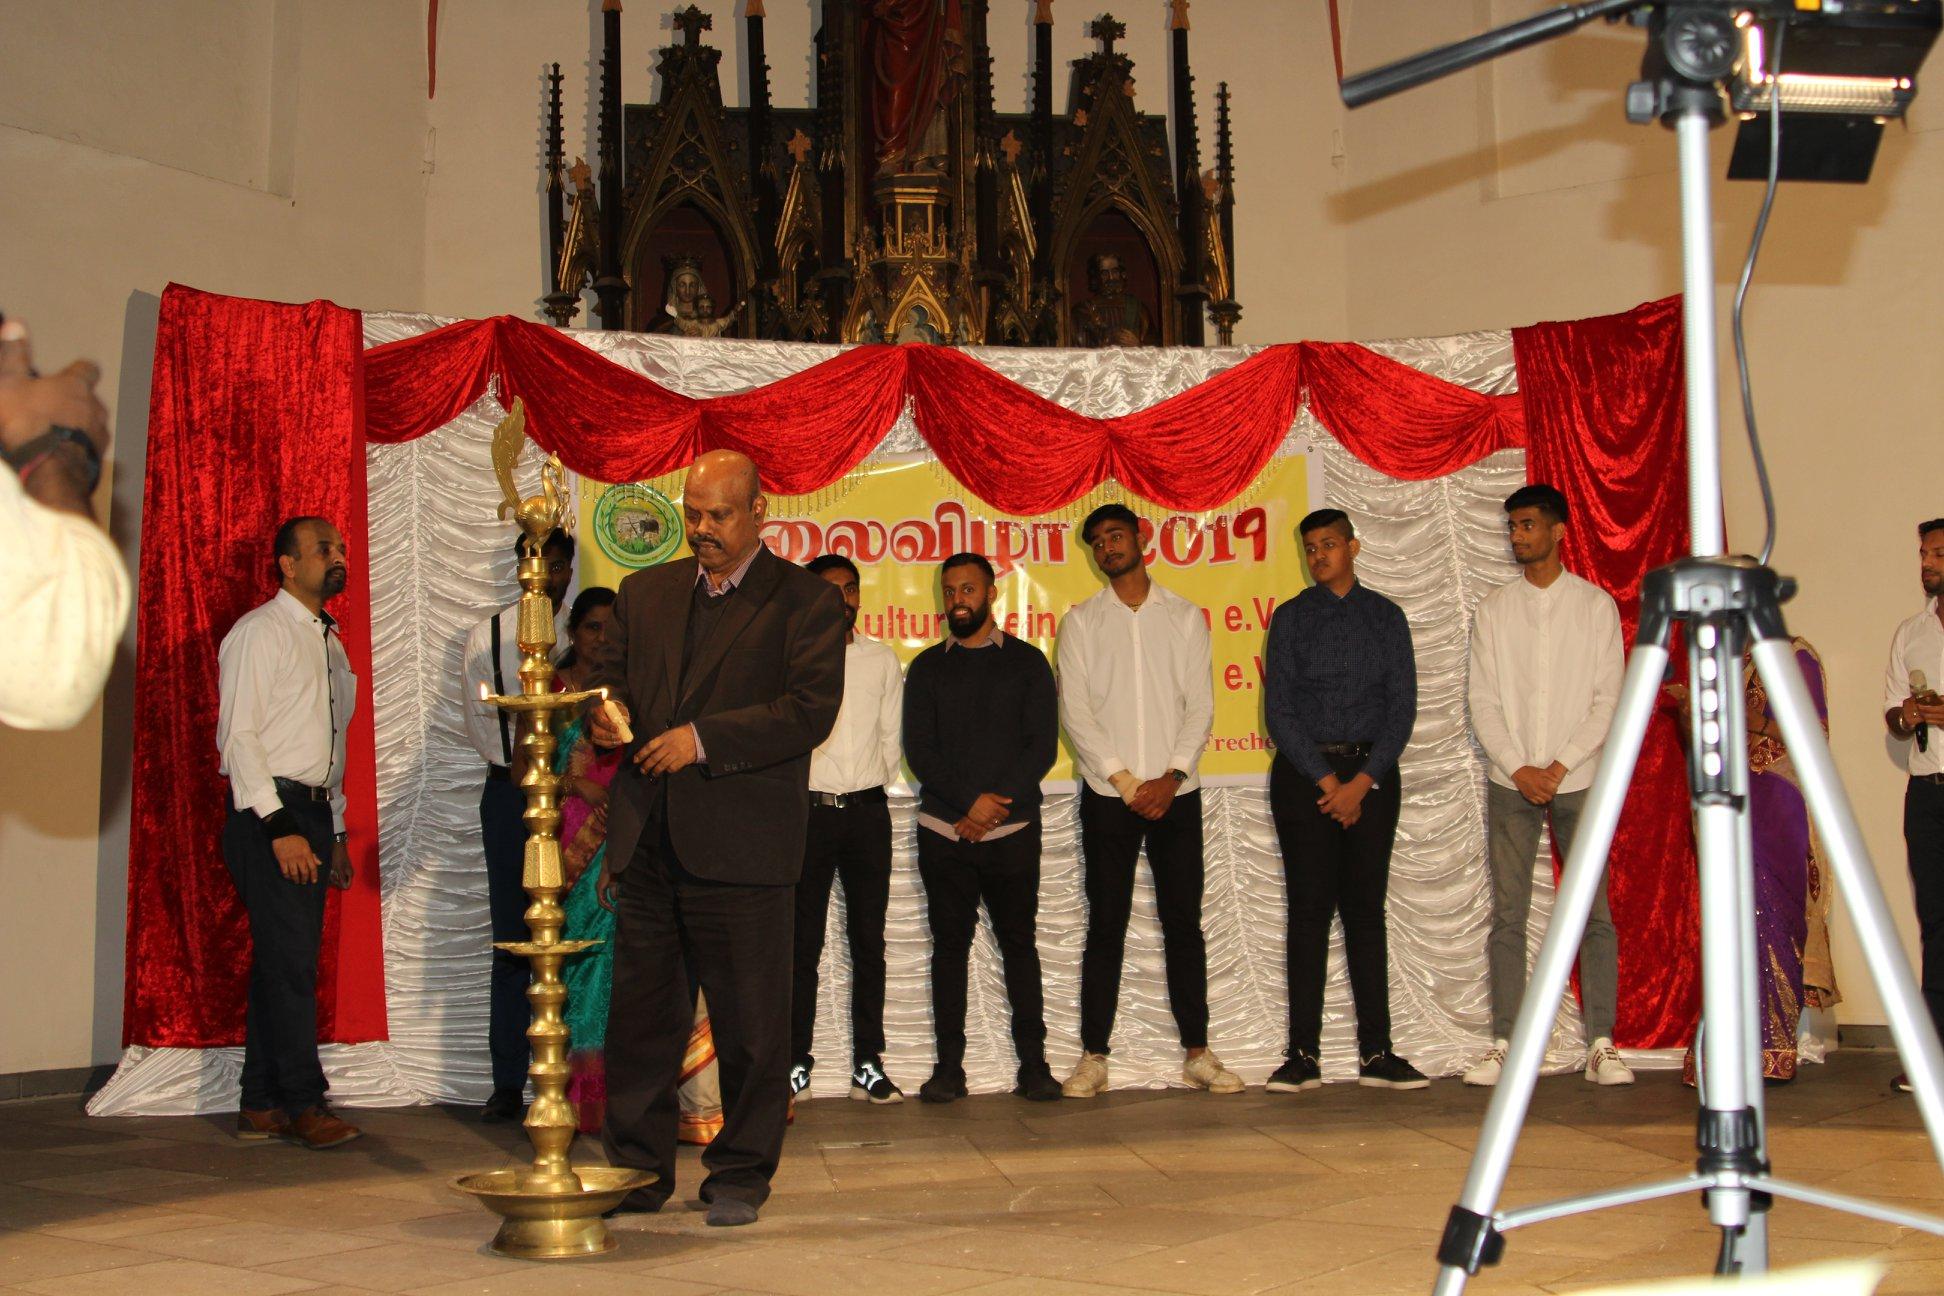 Germany Frechen நகரில் இடம்பெற்ற 7ஆவது ஆண்டு நிறைவு விழா